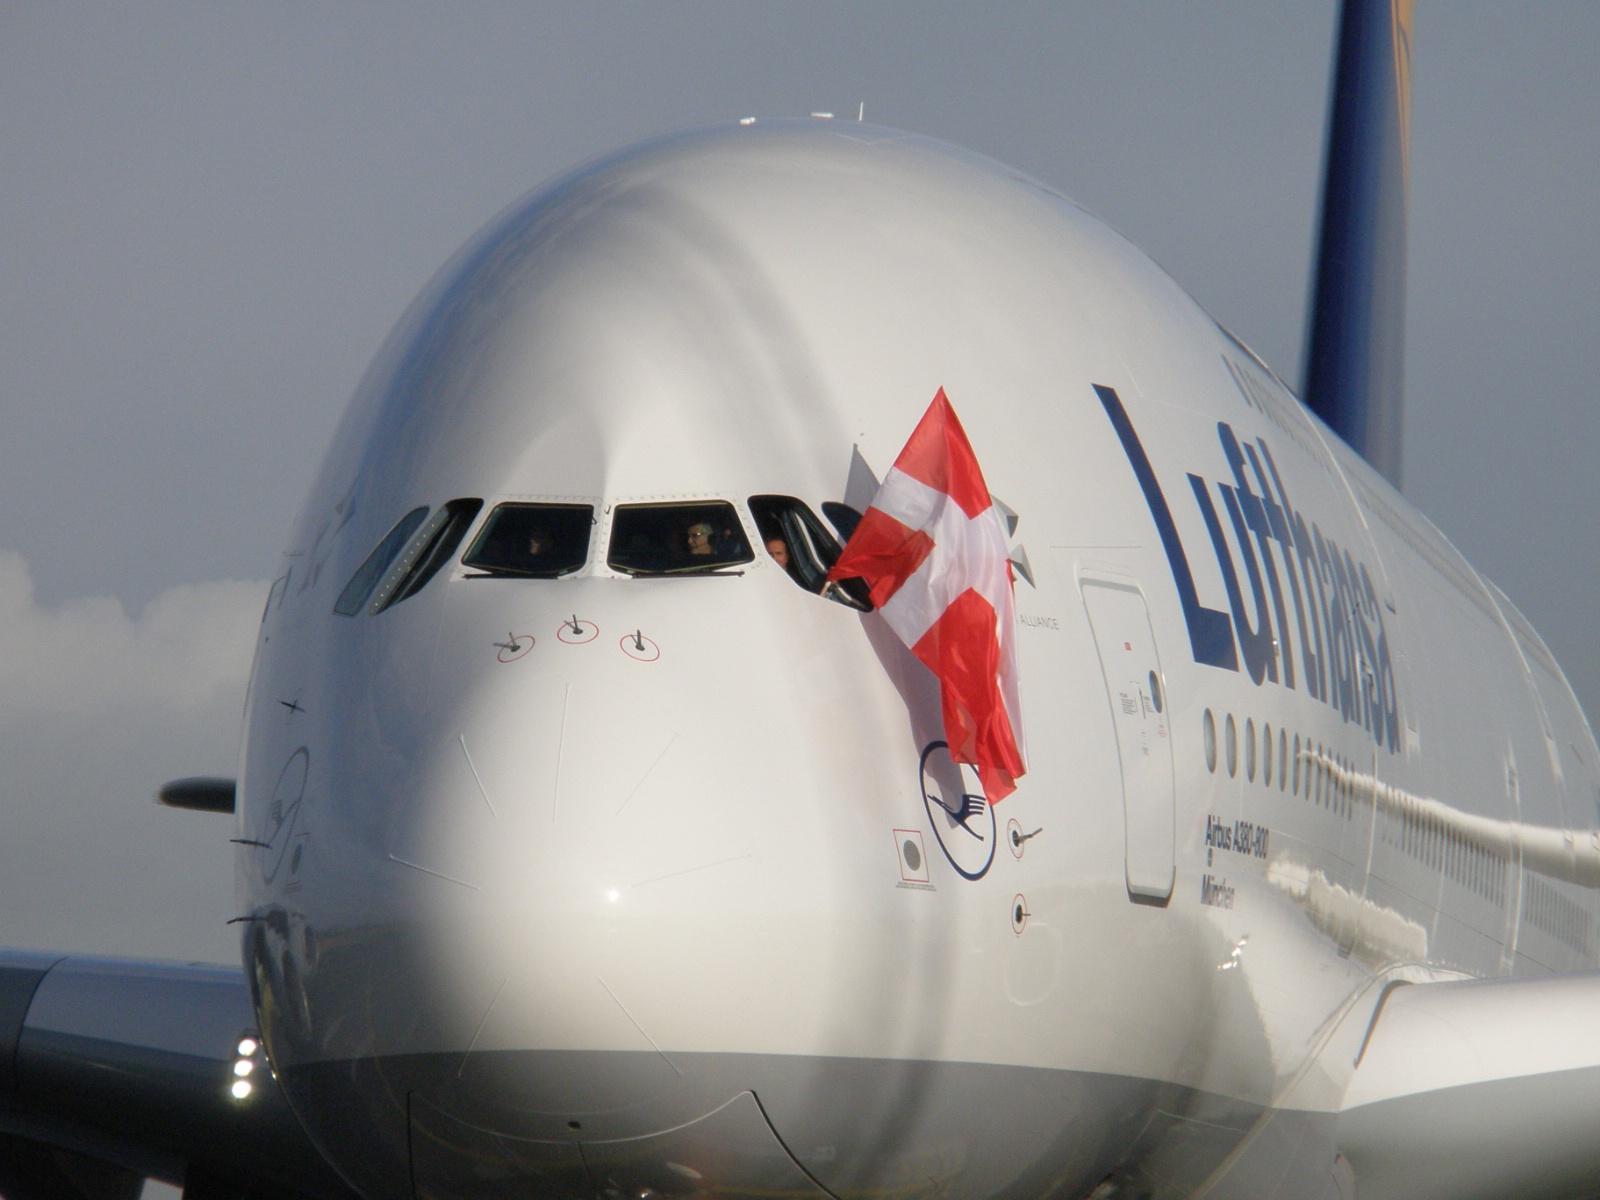 Lufthansas A380-800 i Københavns Lufthavn. (Foto: Ole Kirchert Christensen)